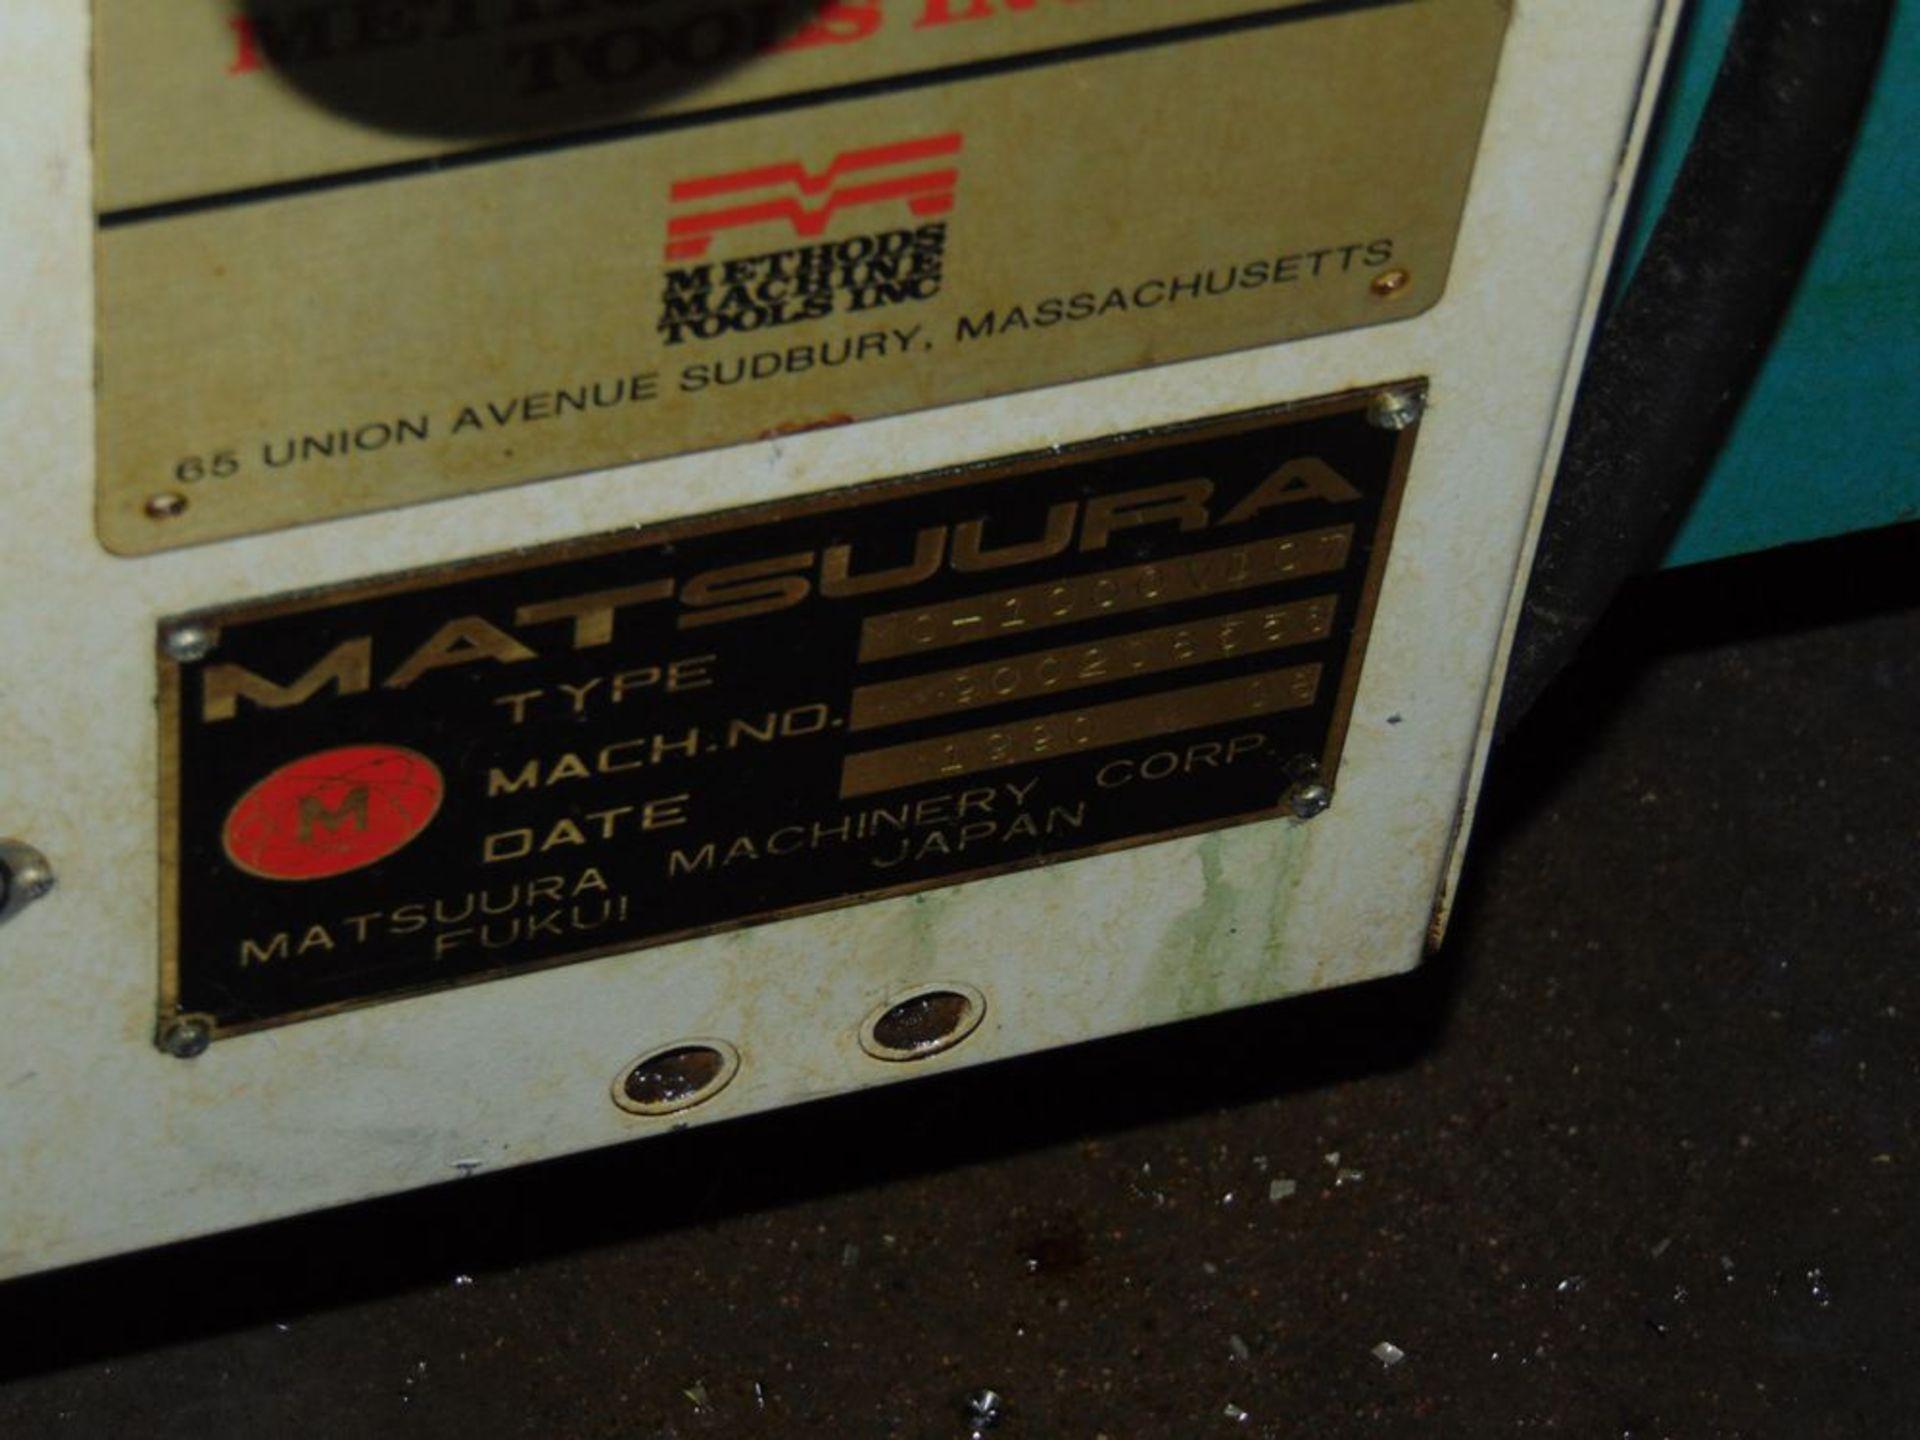 Lot 25 - (1990) Matsuura mod. MC1000 VDCA, 3-Axis CNC Vertical Machine Center, Dual Spindle, 3' x 4' Table,